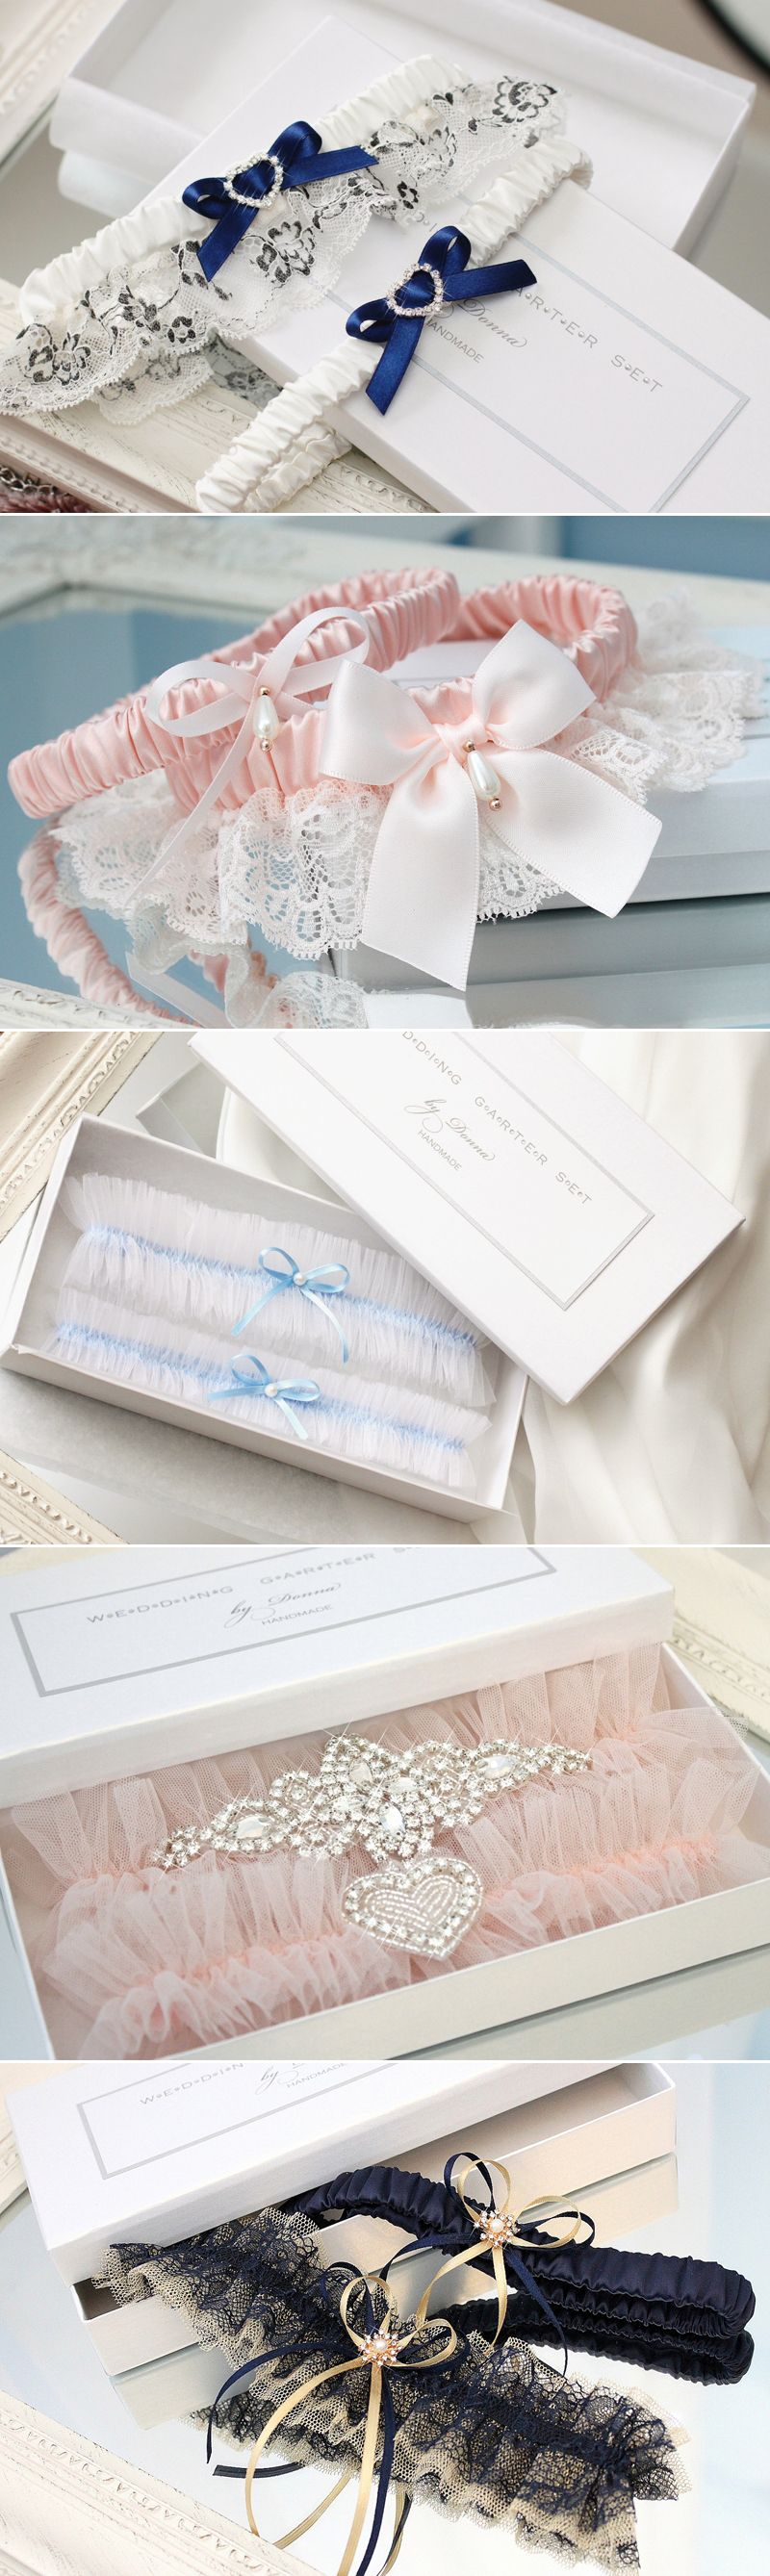 31 utterly romantic wedding garters you'll love! | wedding garters